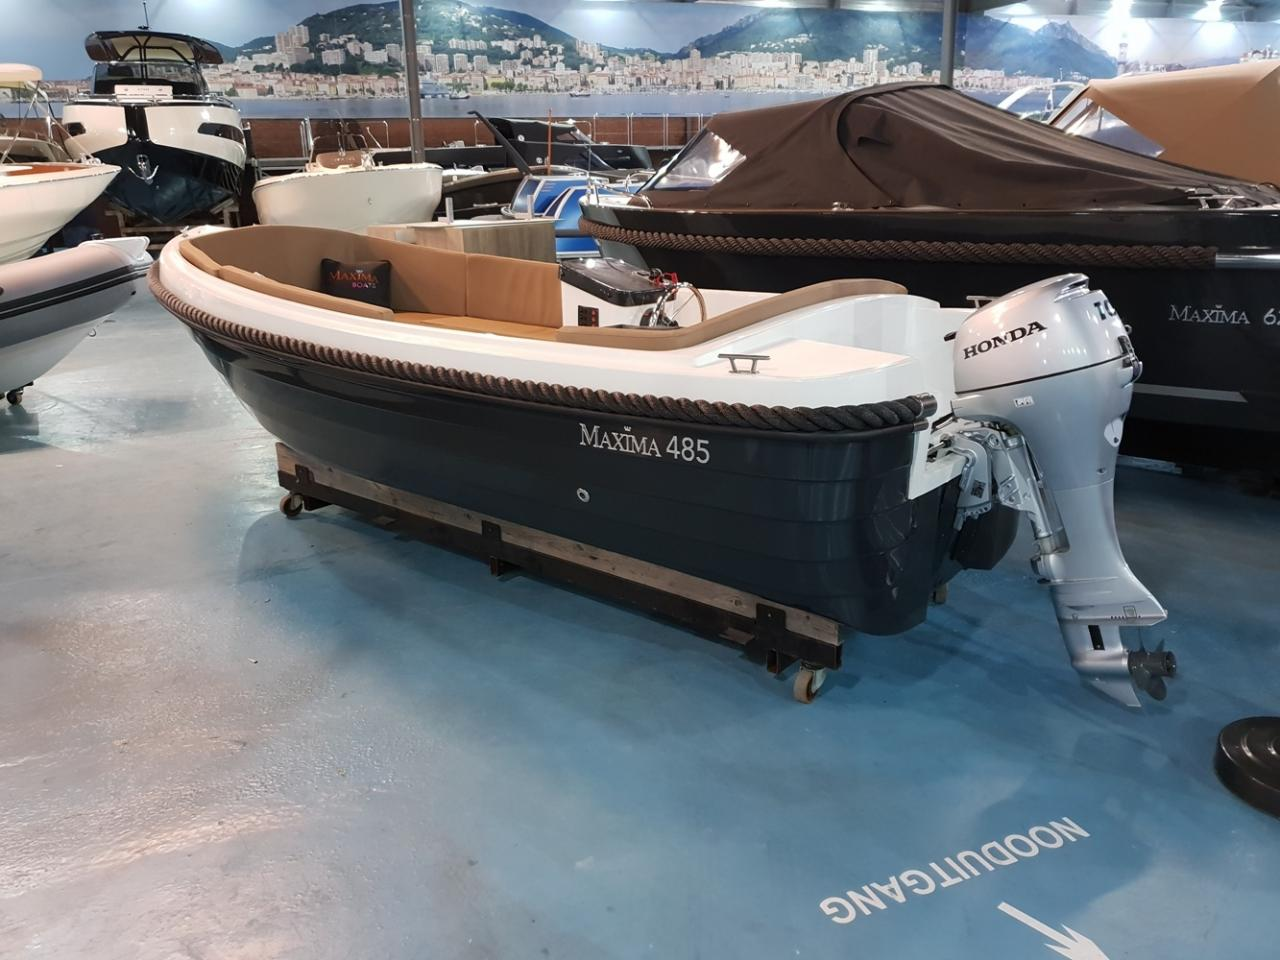 Maxima 485 met 10 pk Honda outboard motor 1